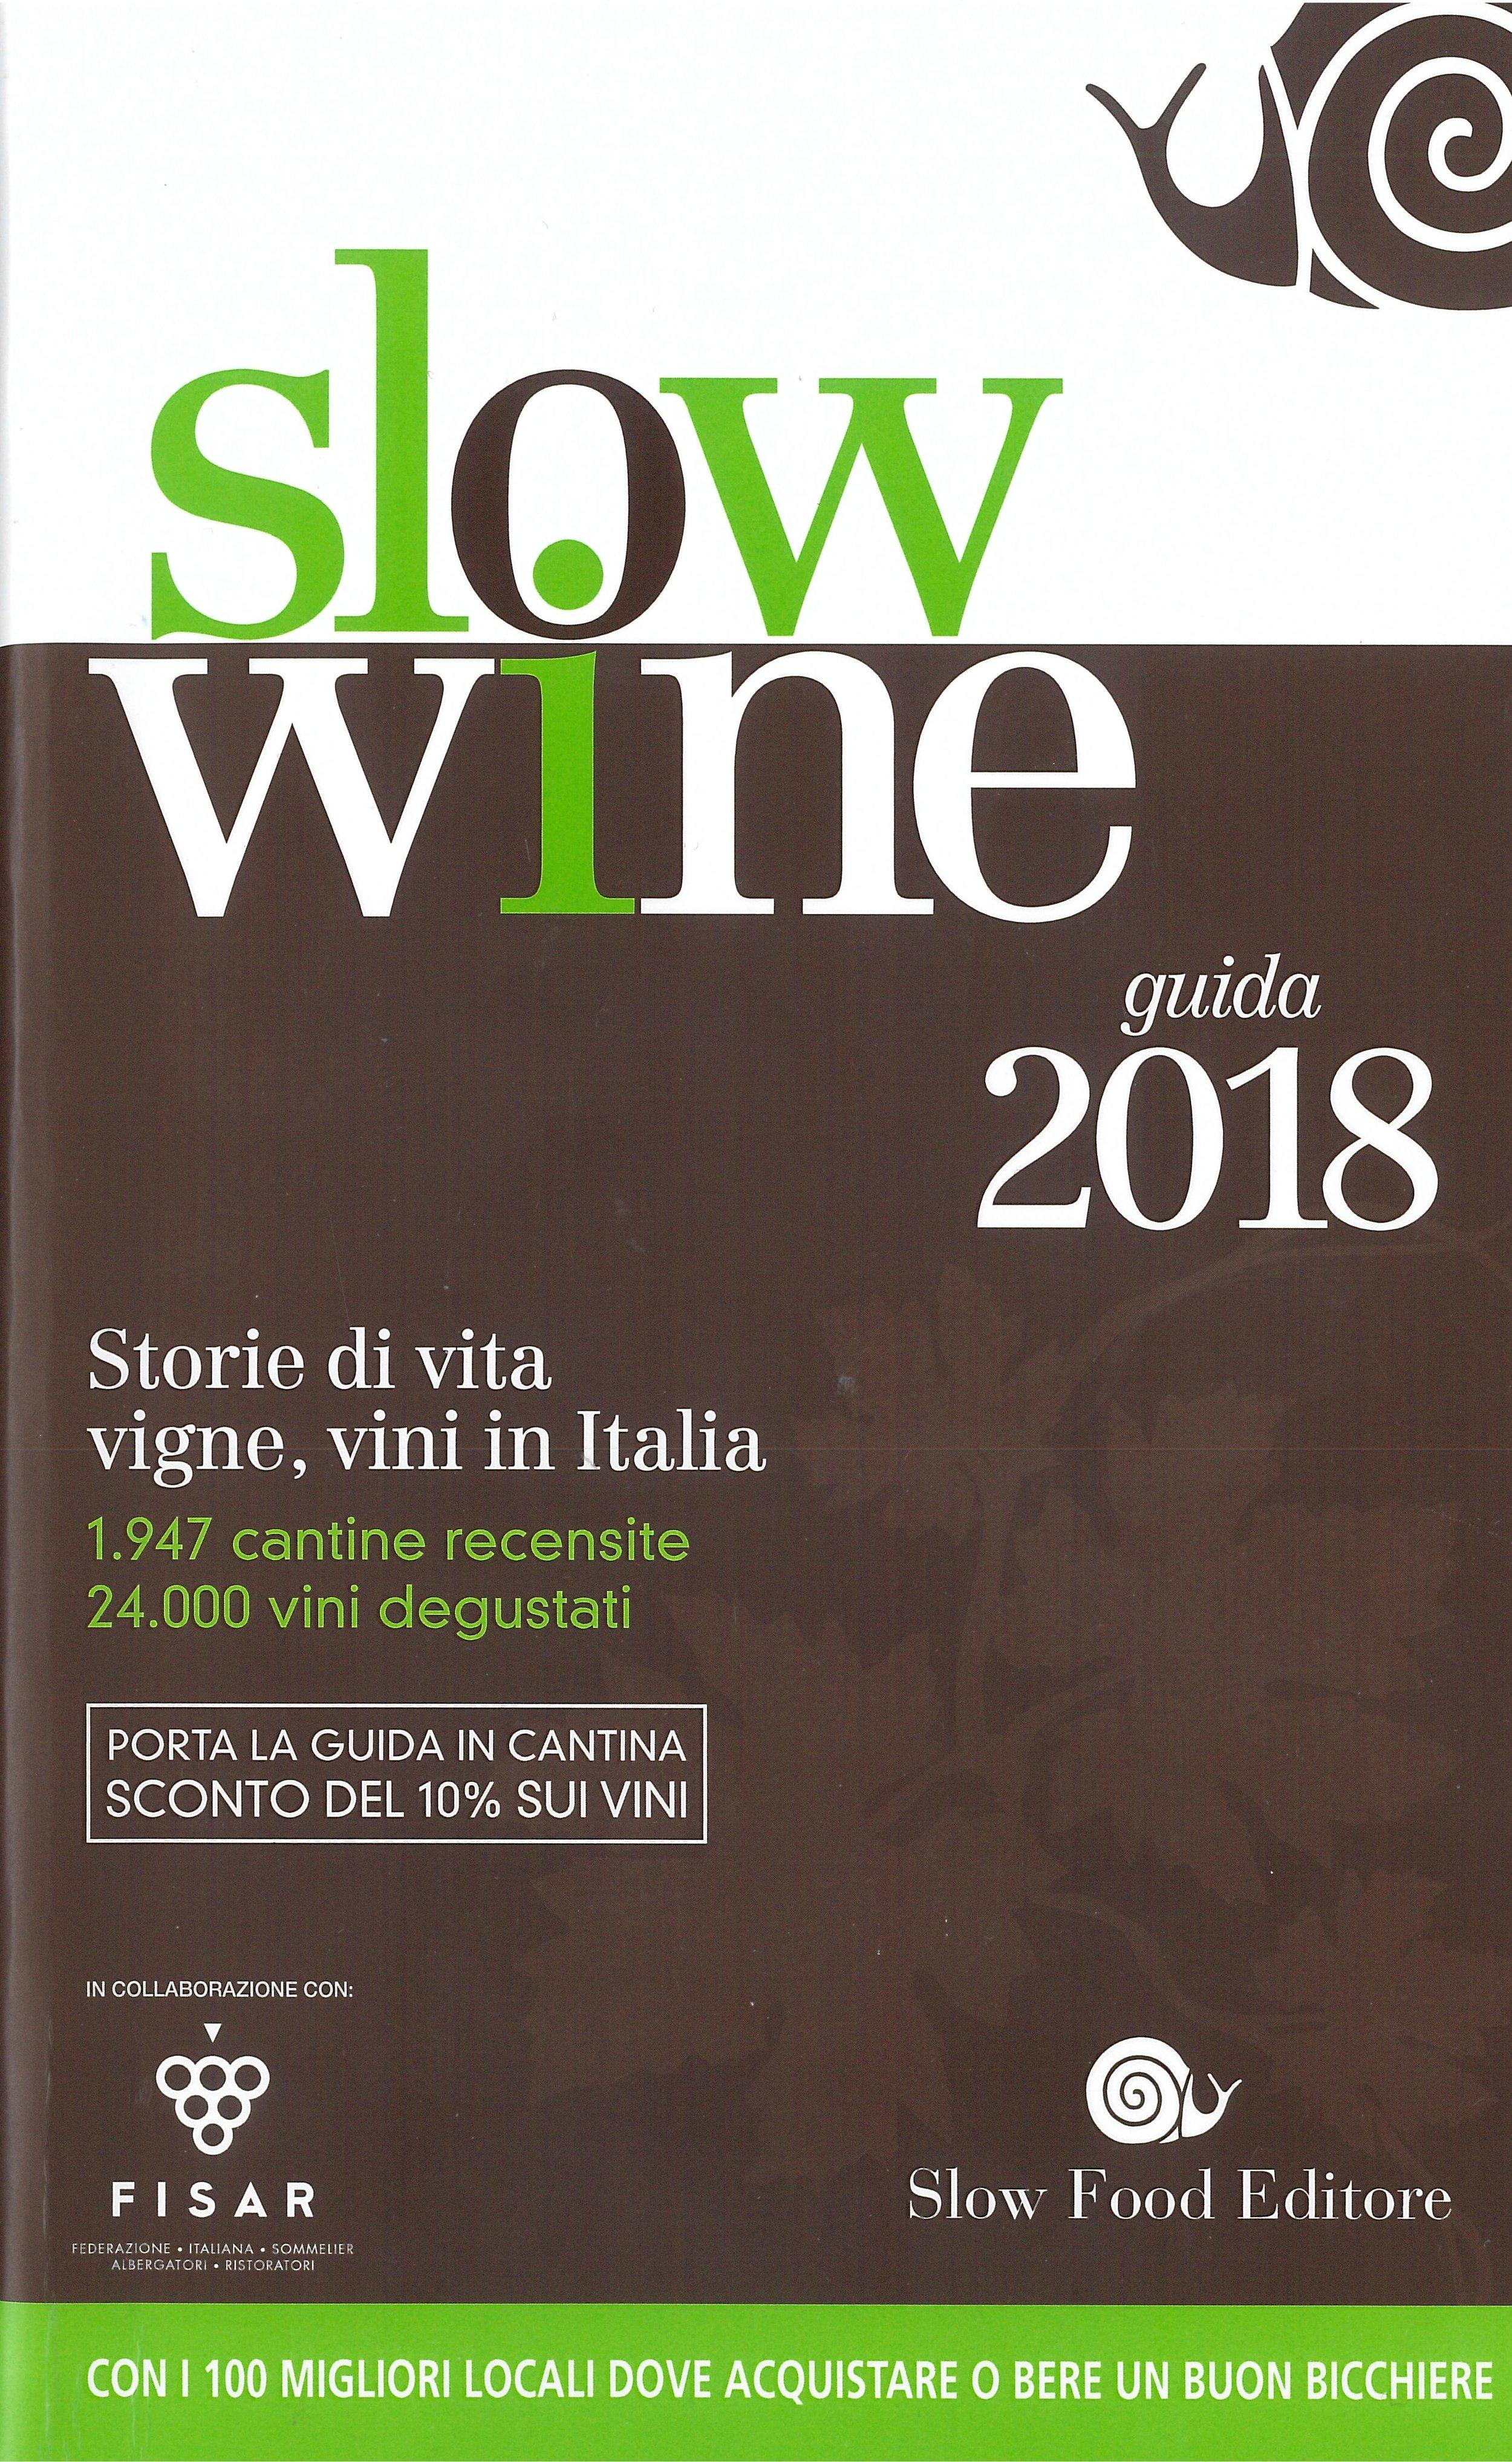 Slow Food Editore_Slow Wine_2018_Cover.jpg